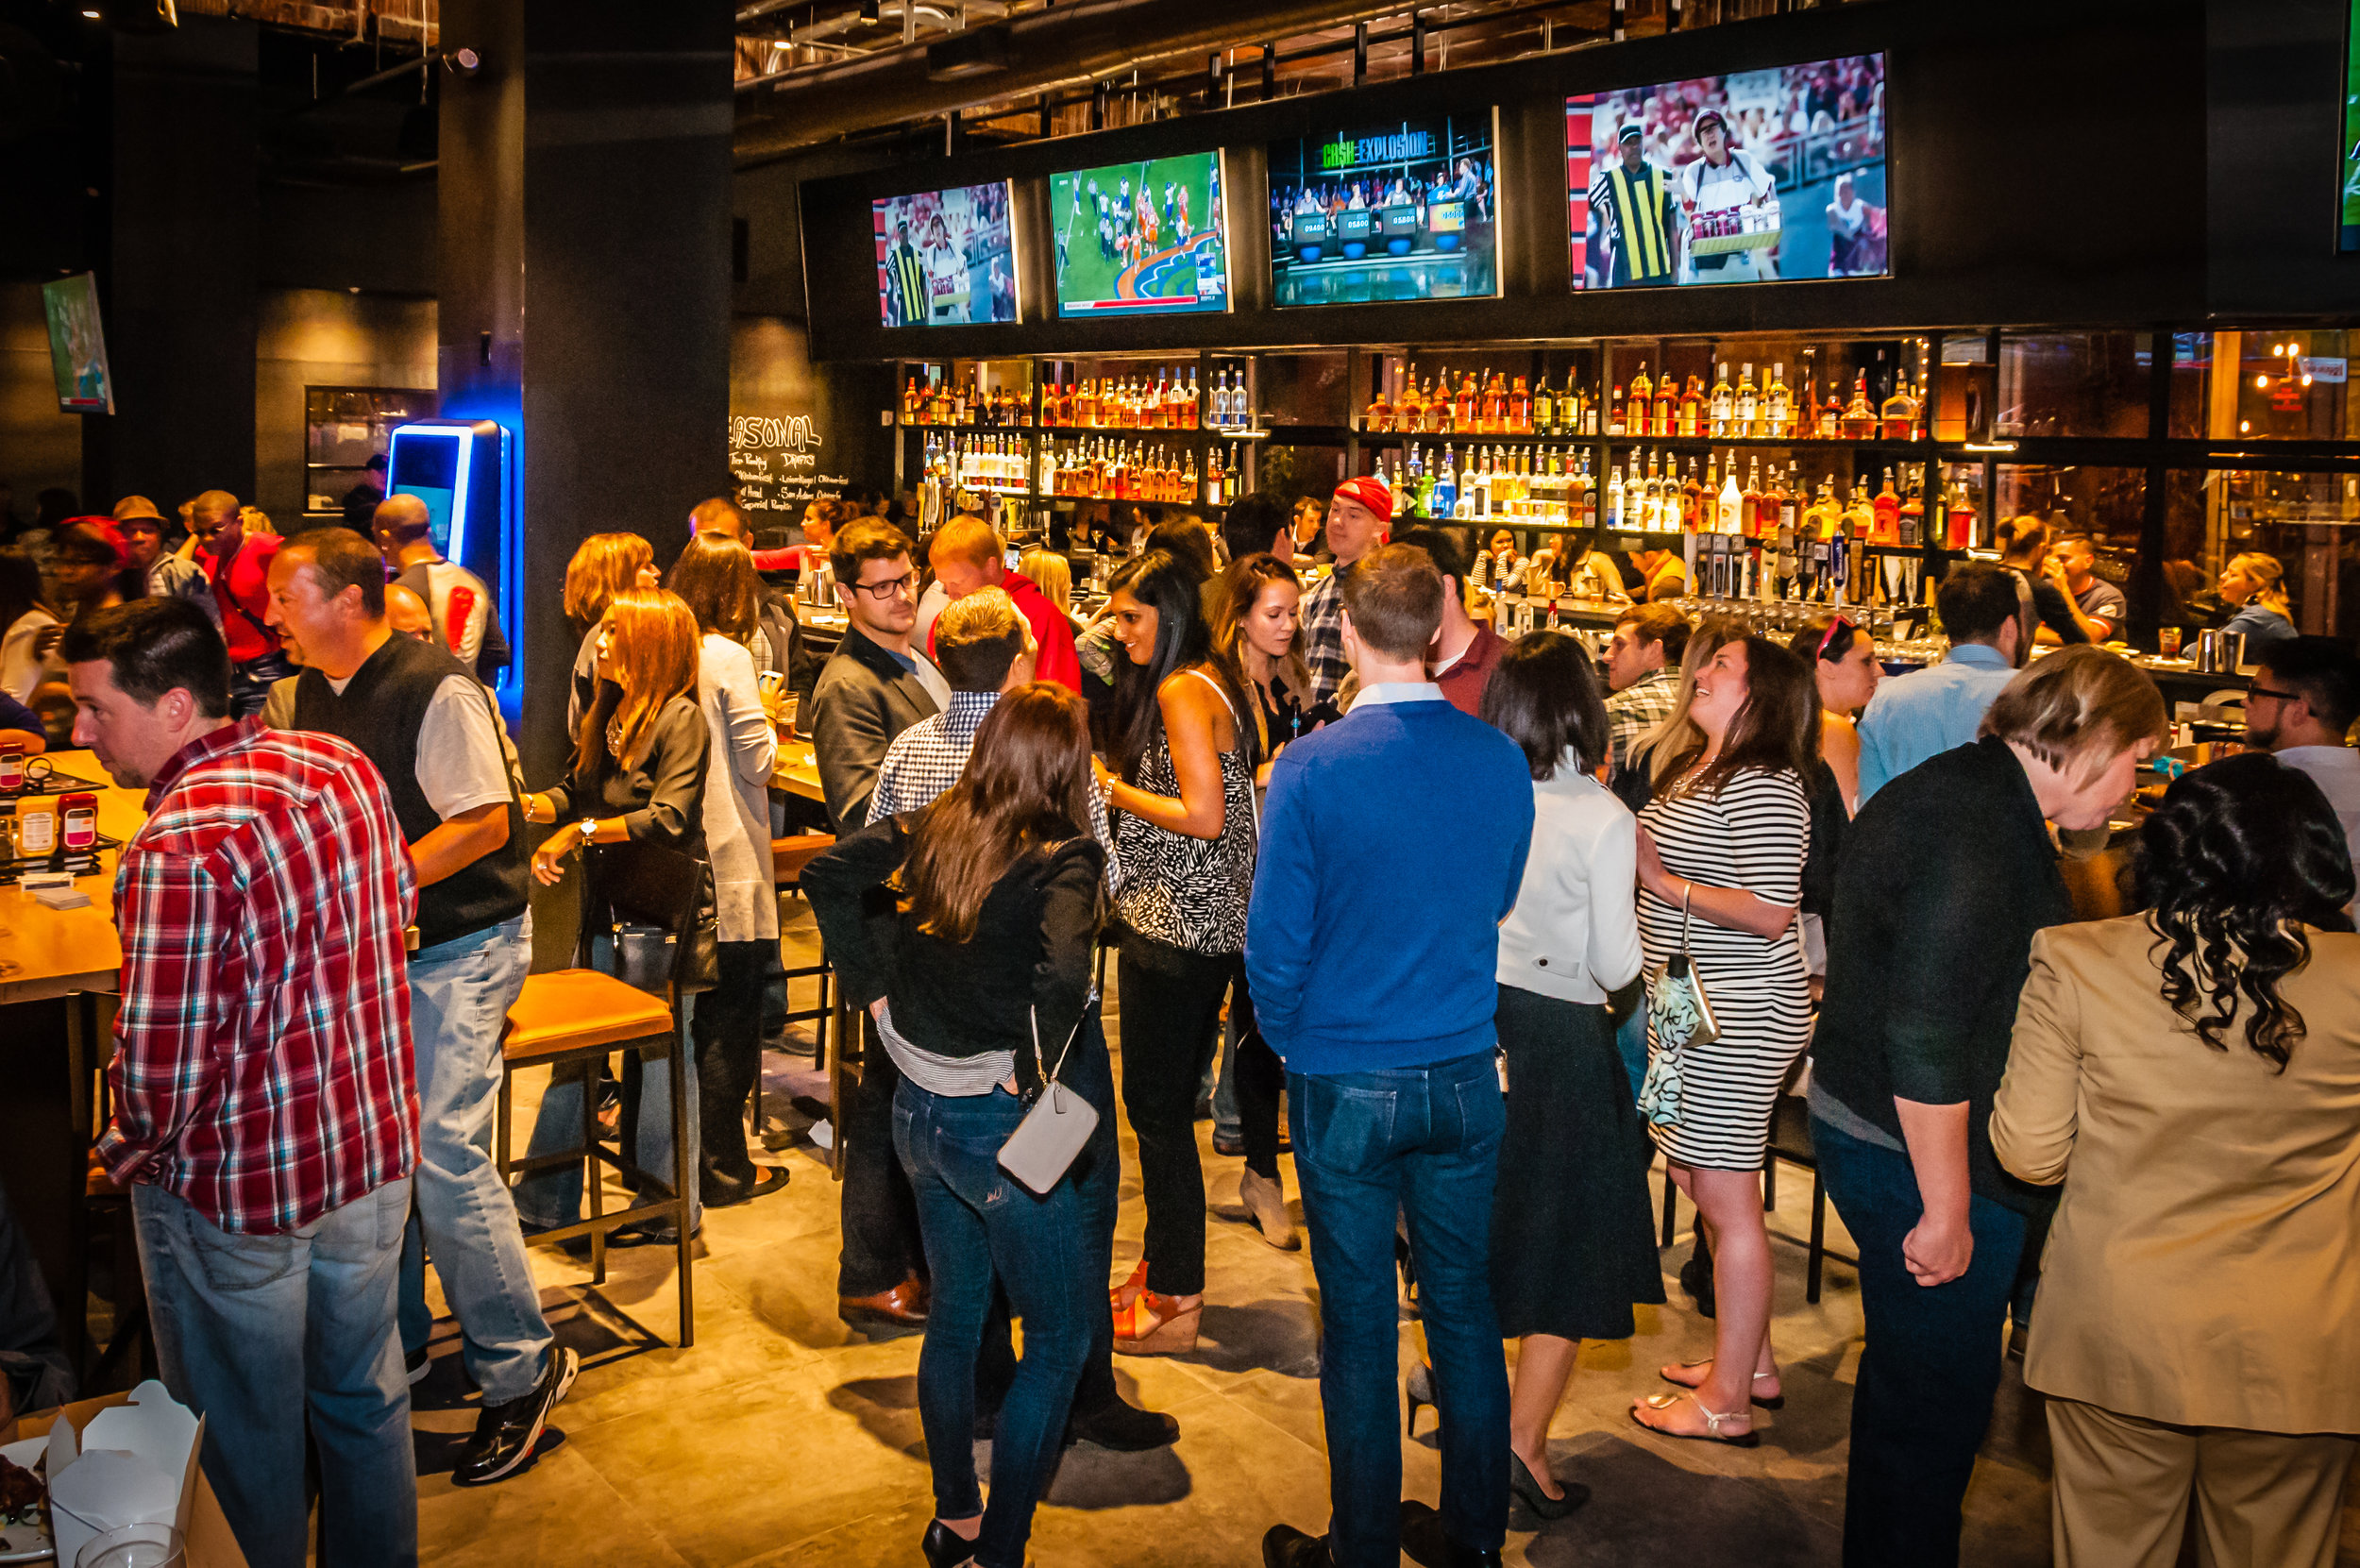 bar-crowd-wide.jpg